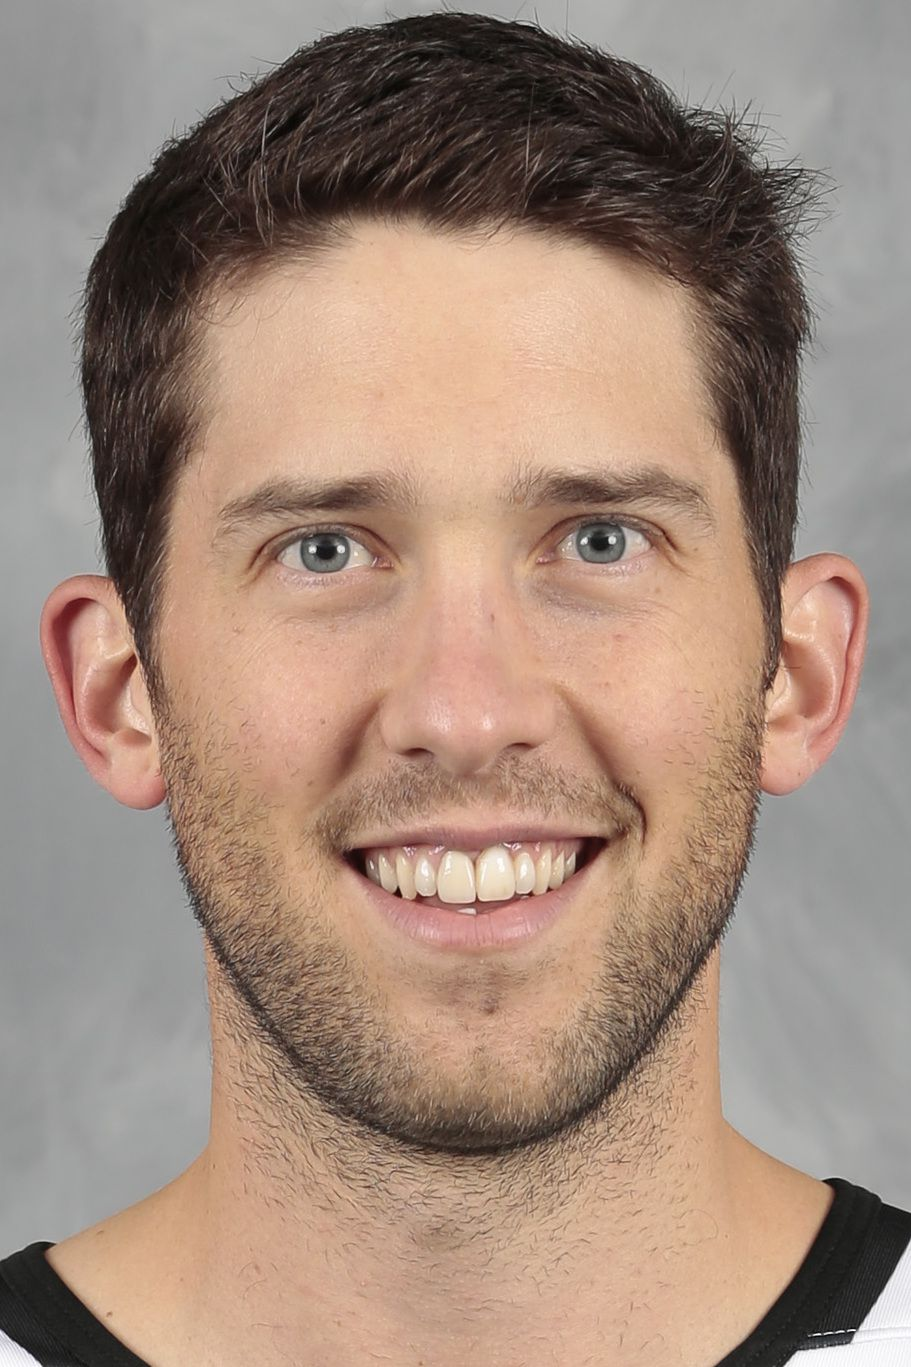 Ben Bishop #30 of the Dallas Stars